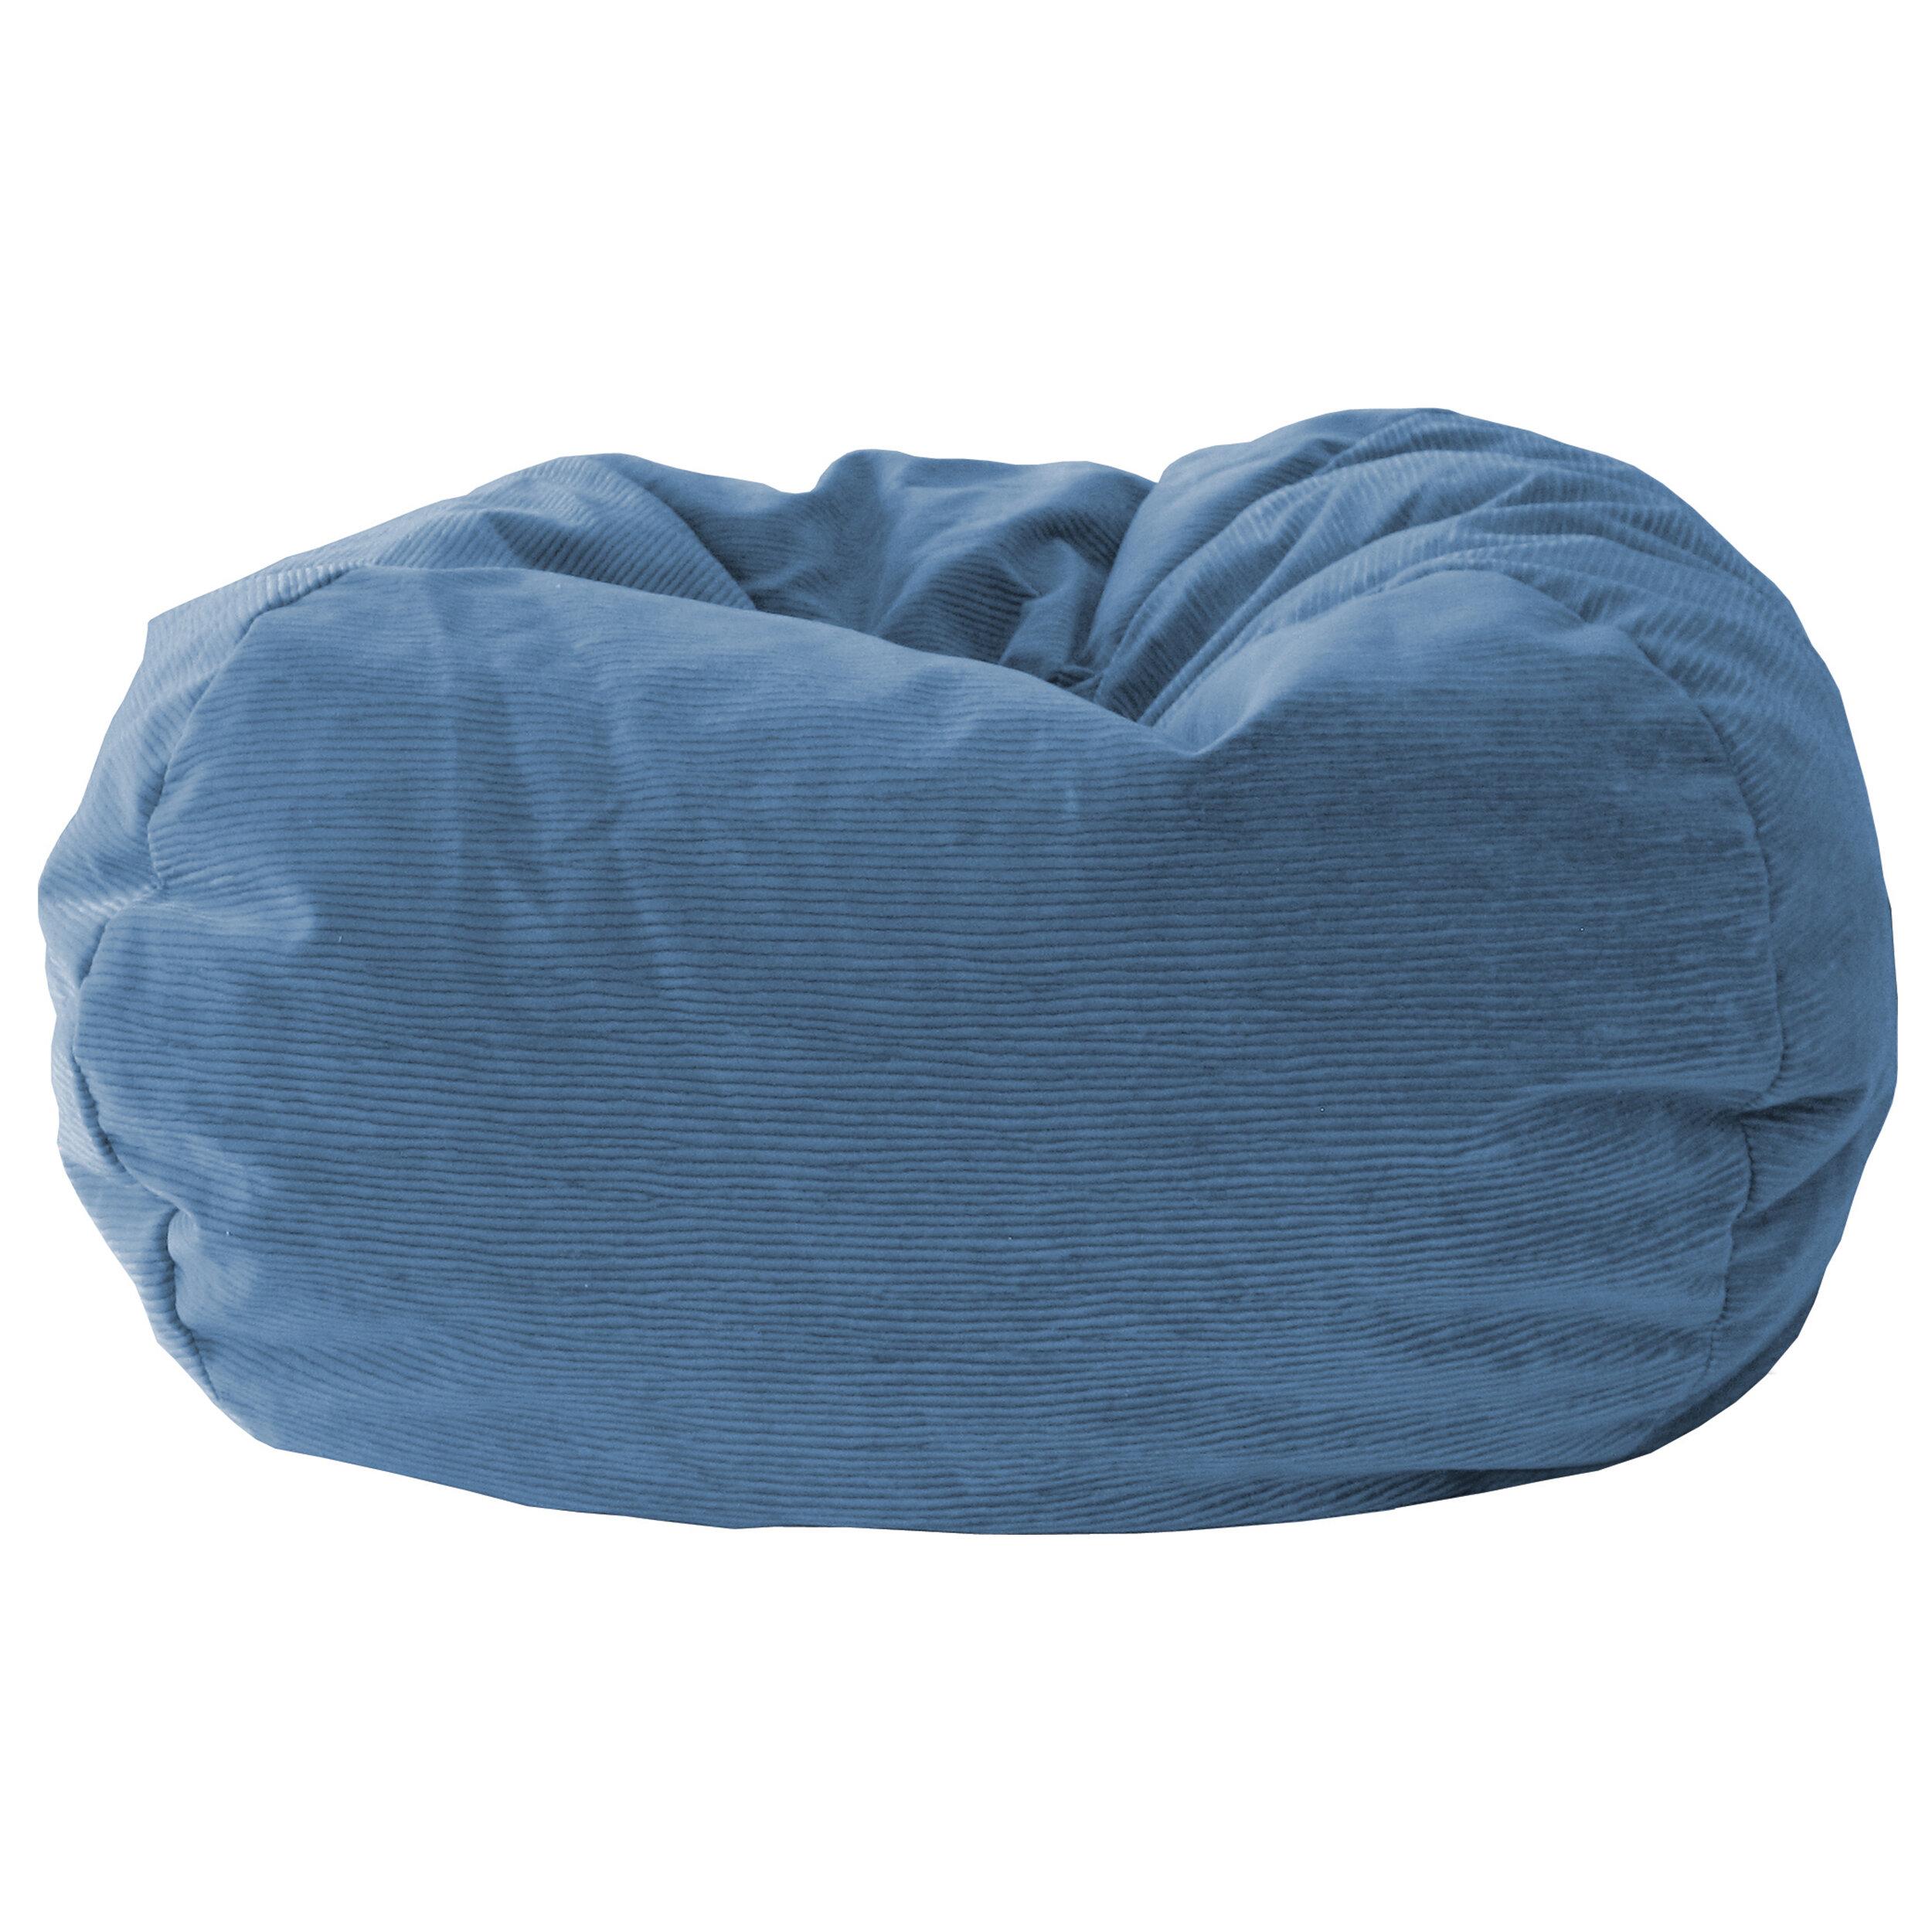 Remarkable Small Bean Bag Chair Forskolin Free Trial Chair Design Images Forskolin Free Trialorg